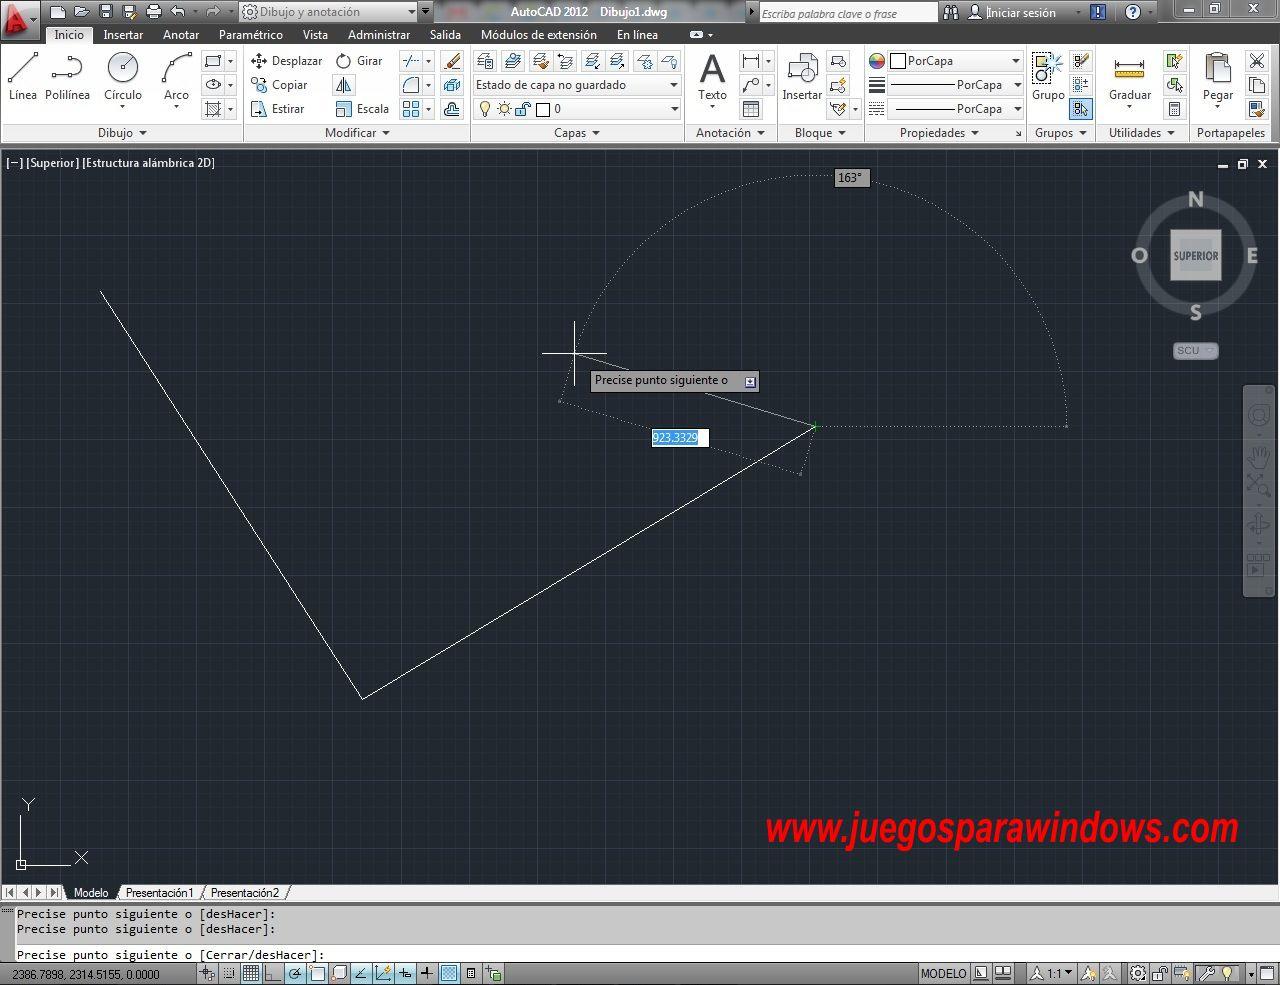 AutoCAD 2012 Español Ingles 32 64 Bits Windows Screenshot